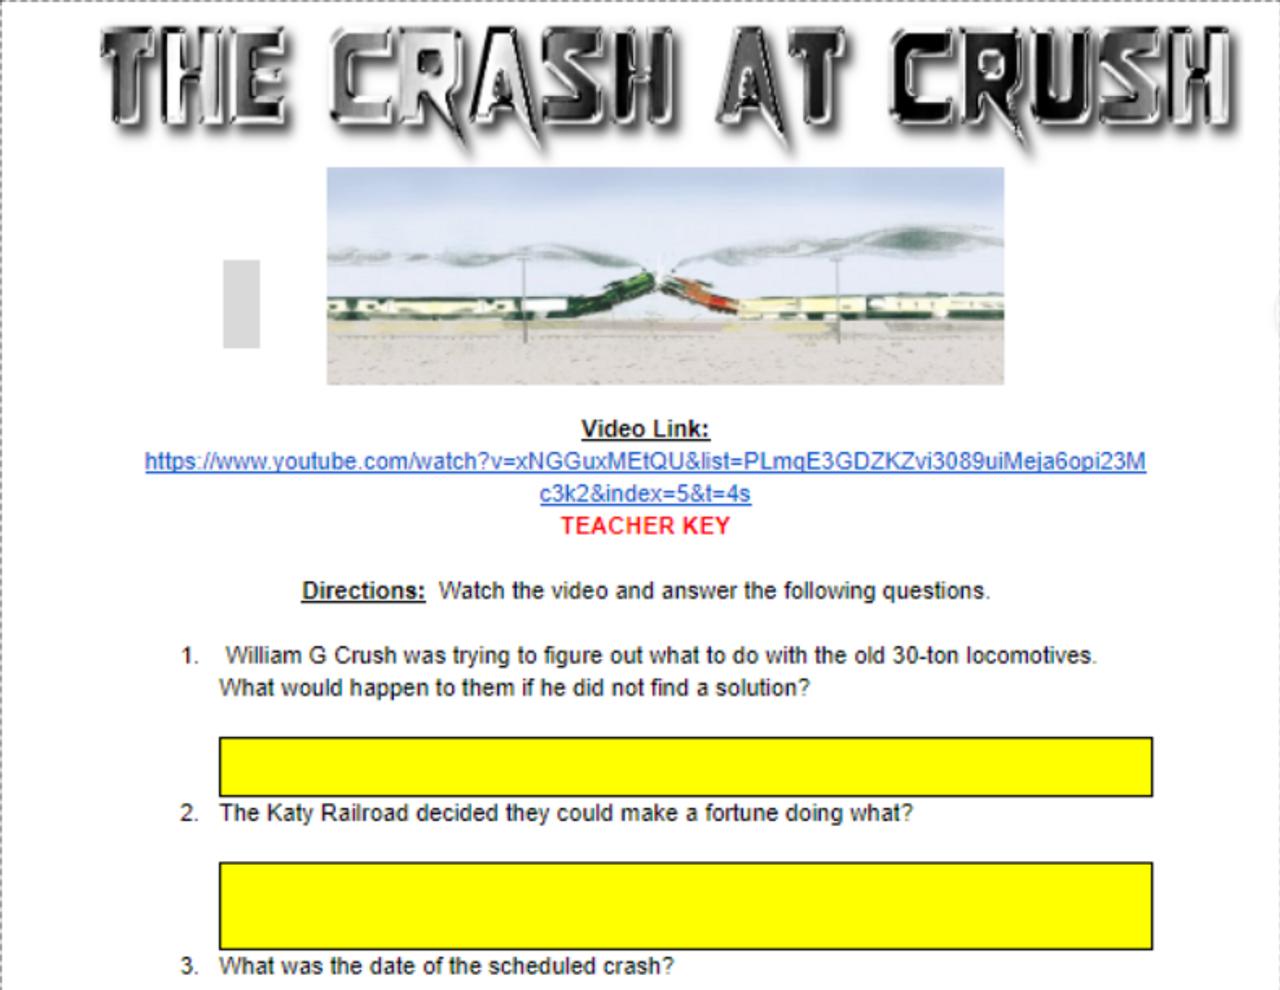 The Crash at Crush